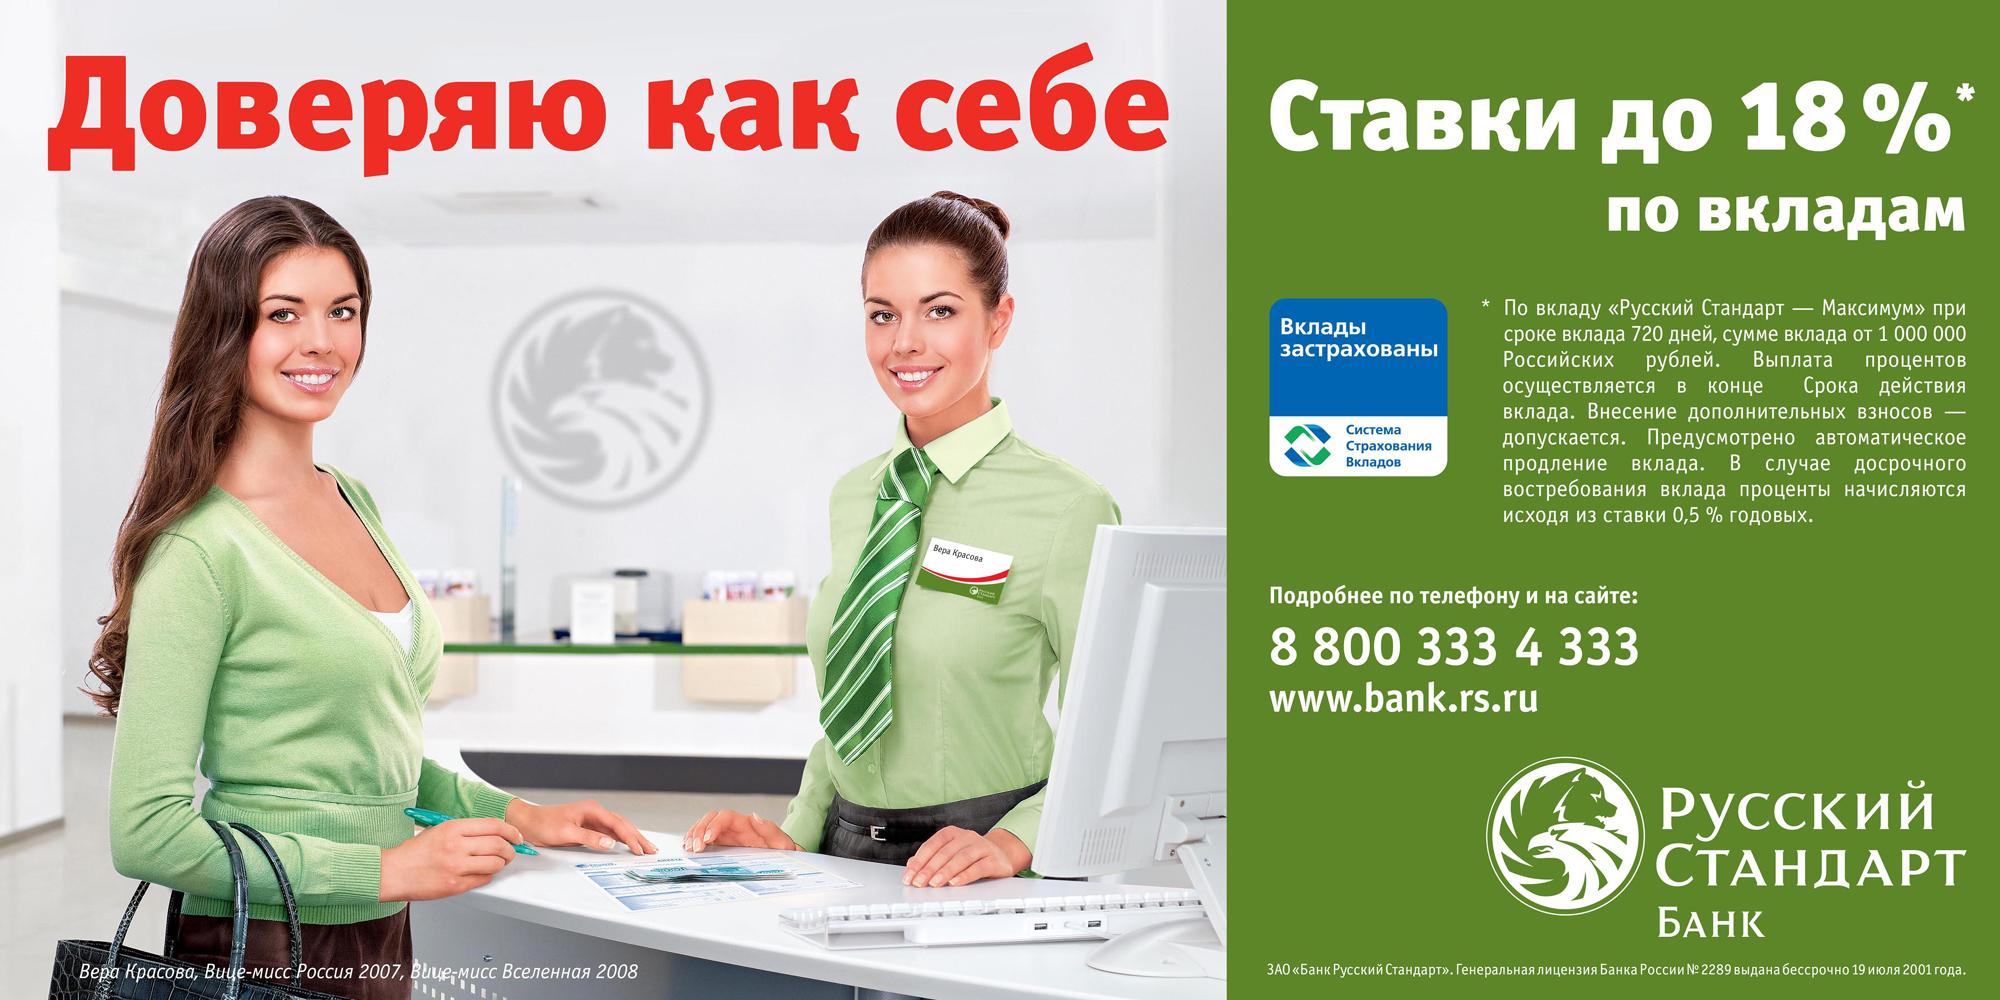 русский стандарт банк взять займ онлайн